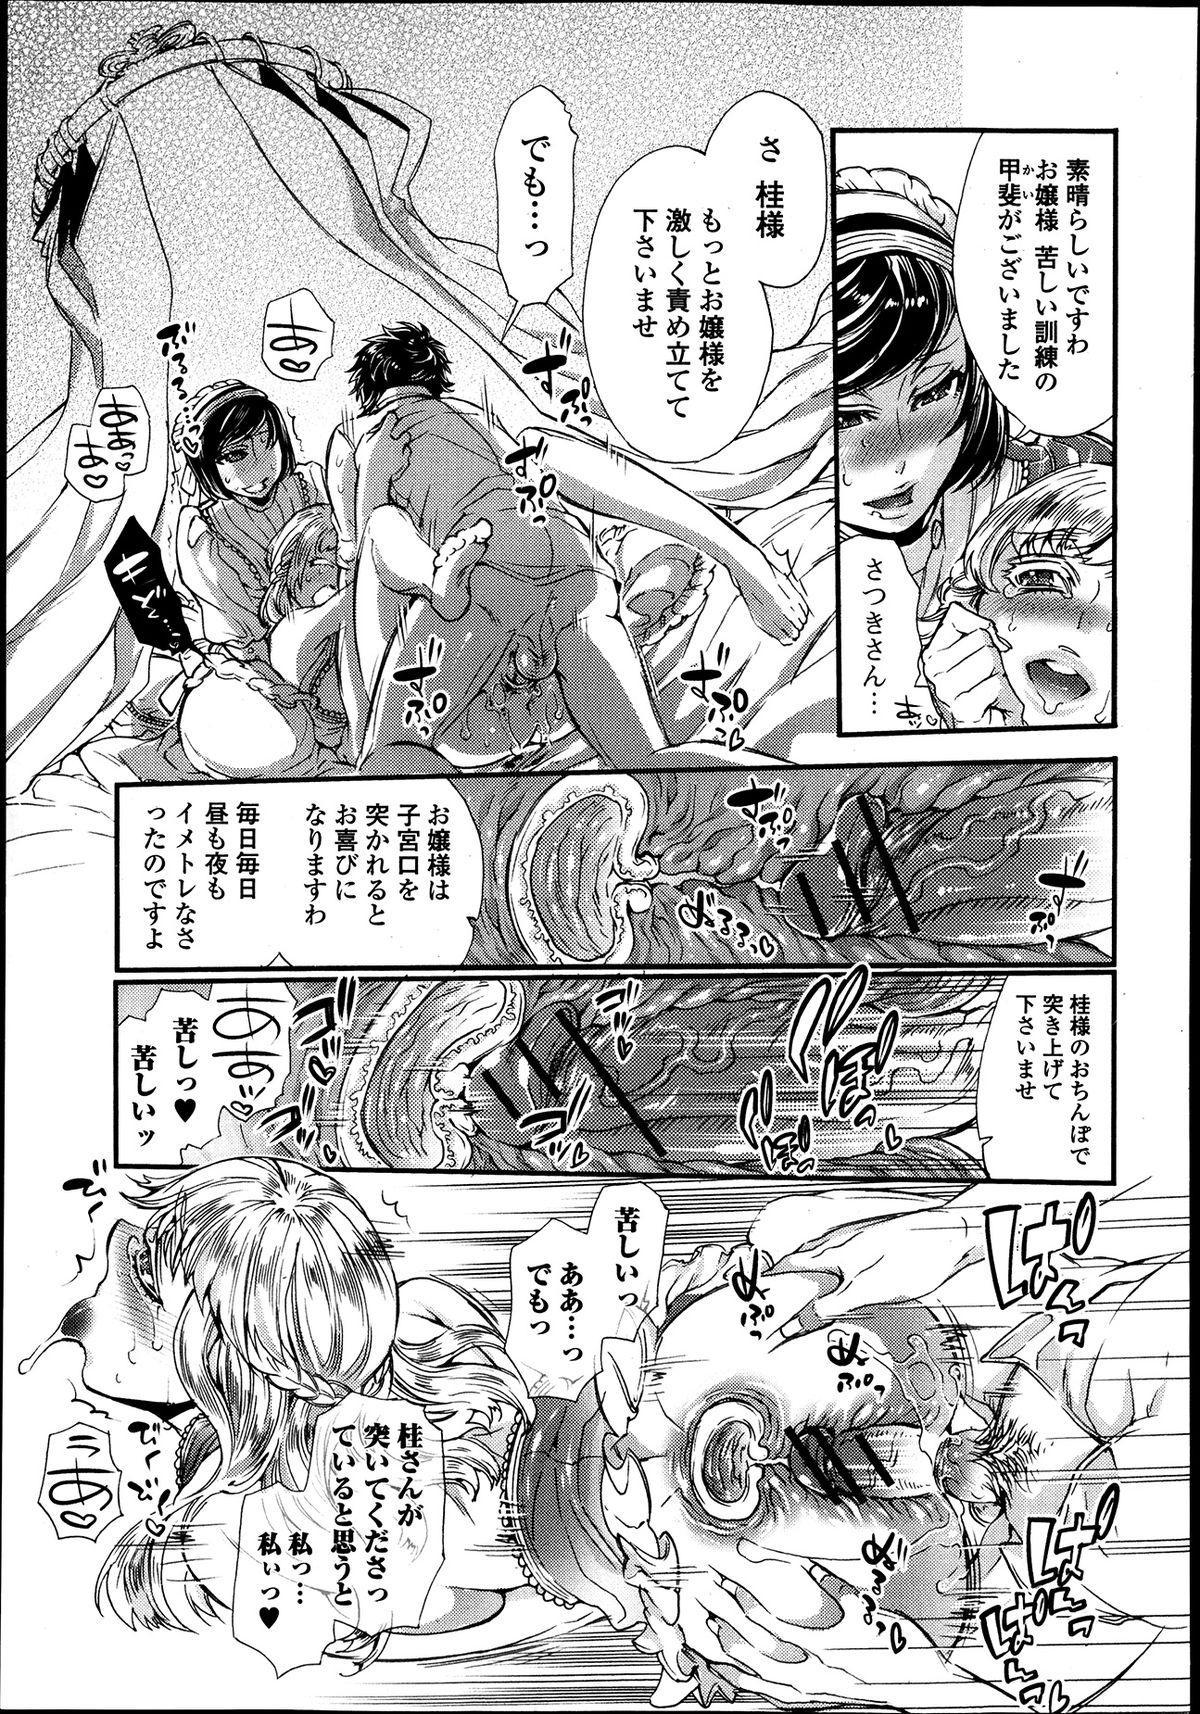 Bishoujo Kakumei KIWAME Road Vol.9 202